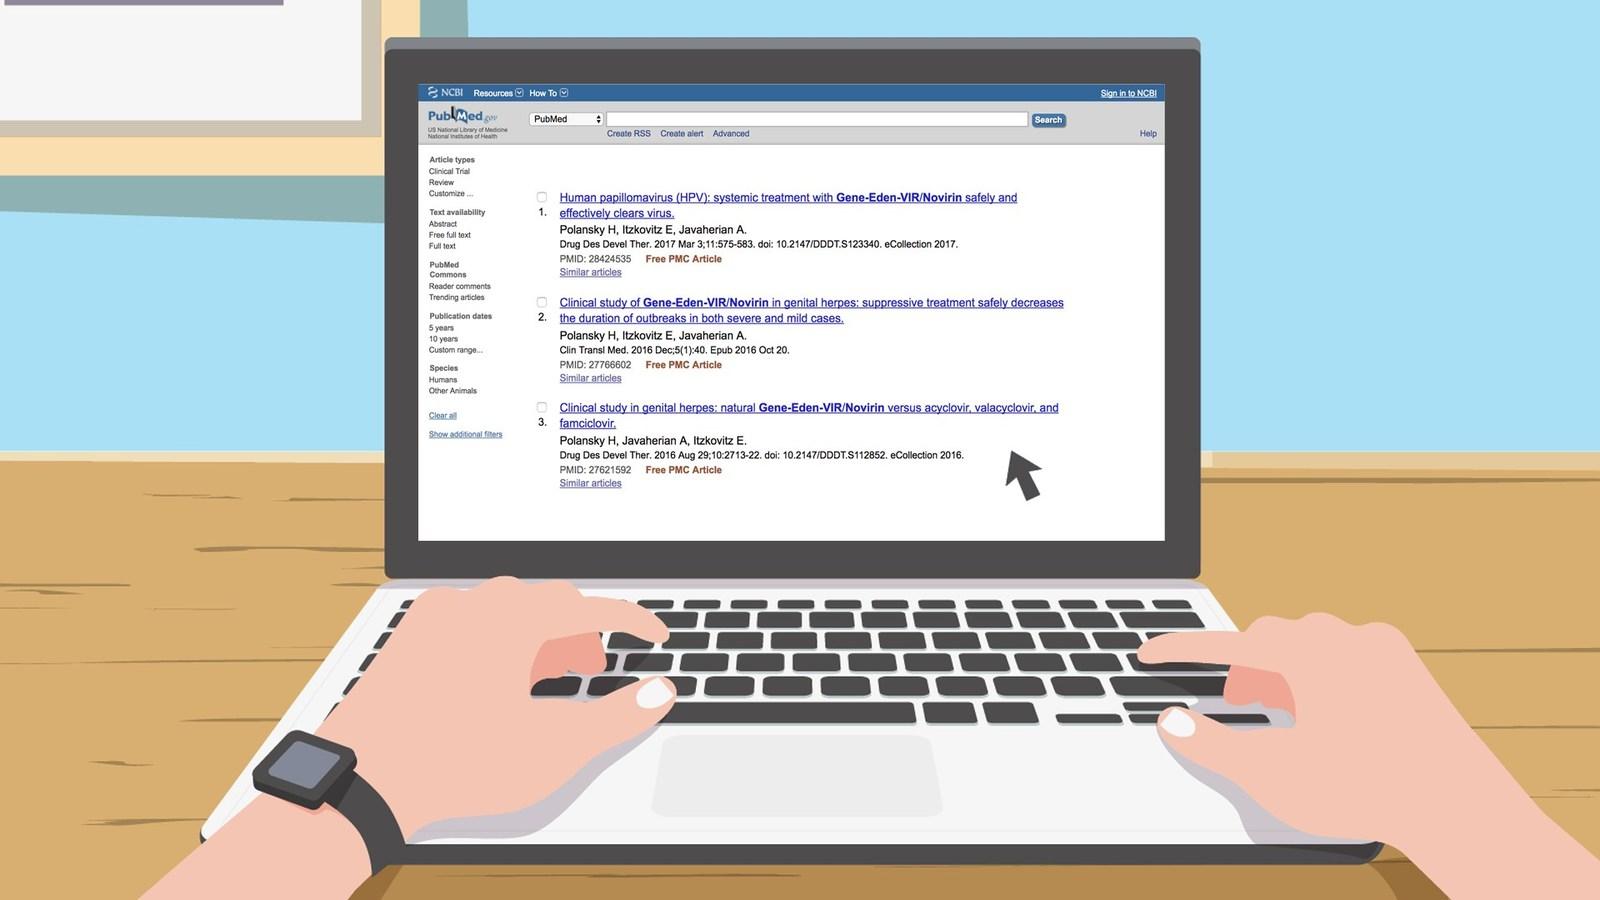 Lilac Corp – Gene-Eden-VIR-Novirin clinical studies listed onPubMed